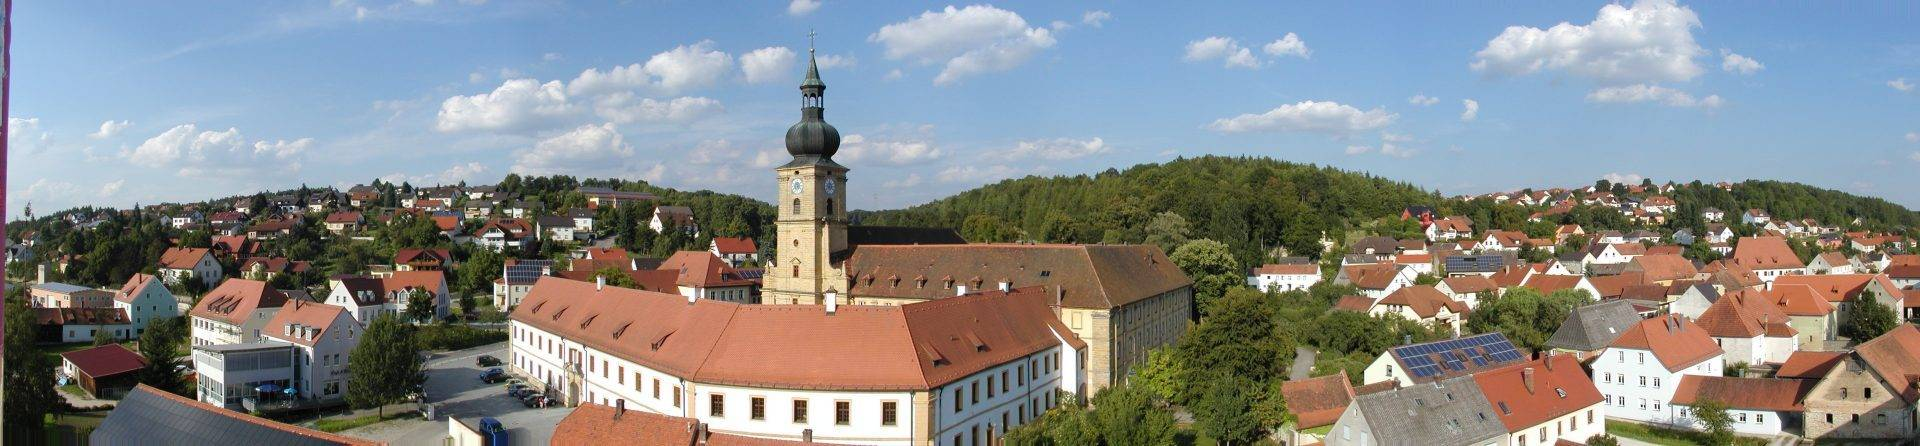 Kloster-Ensdorf-Pano-2